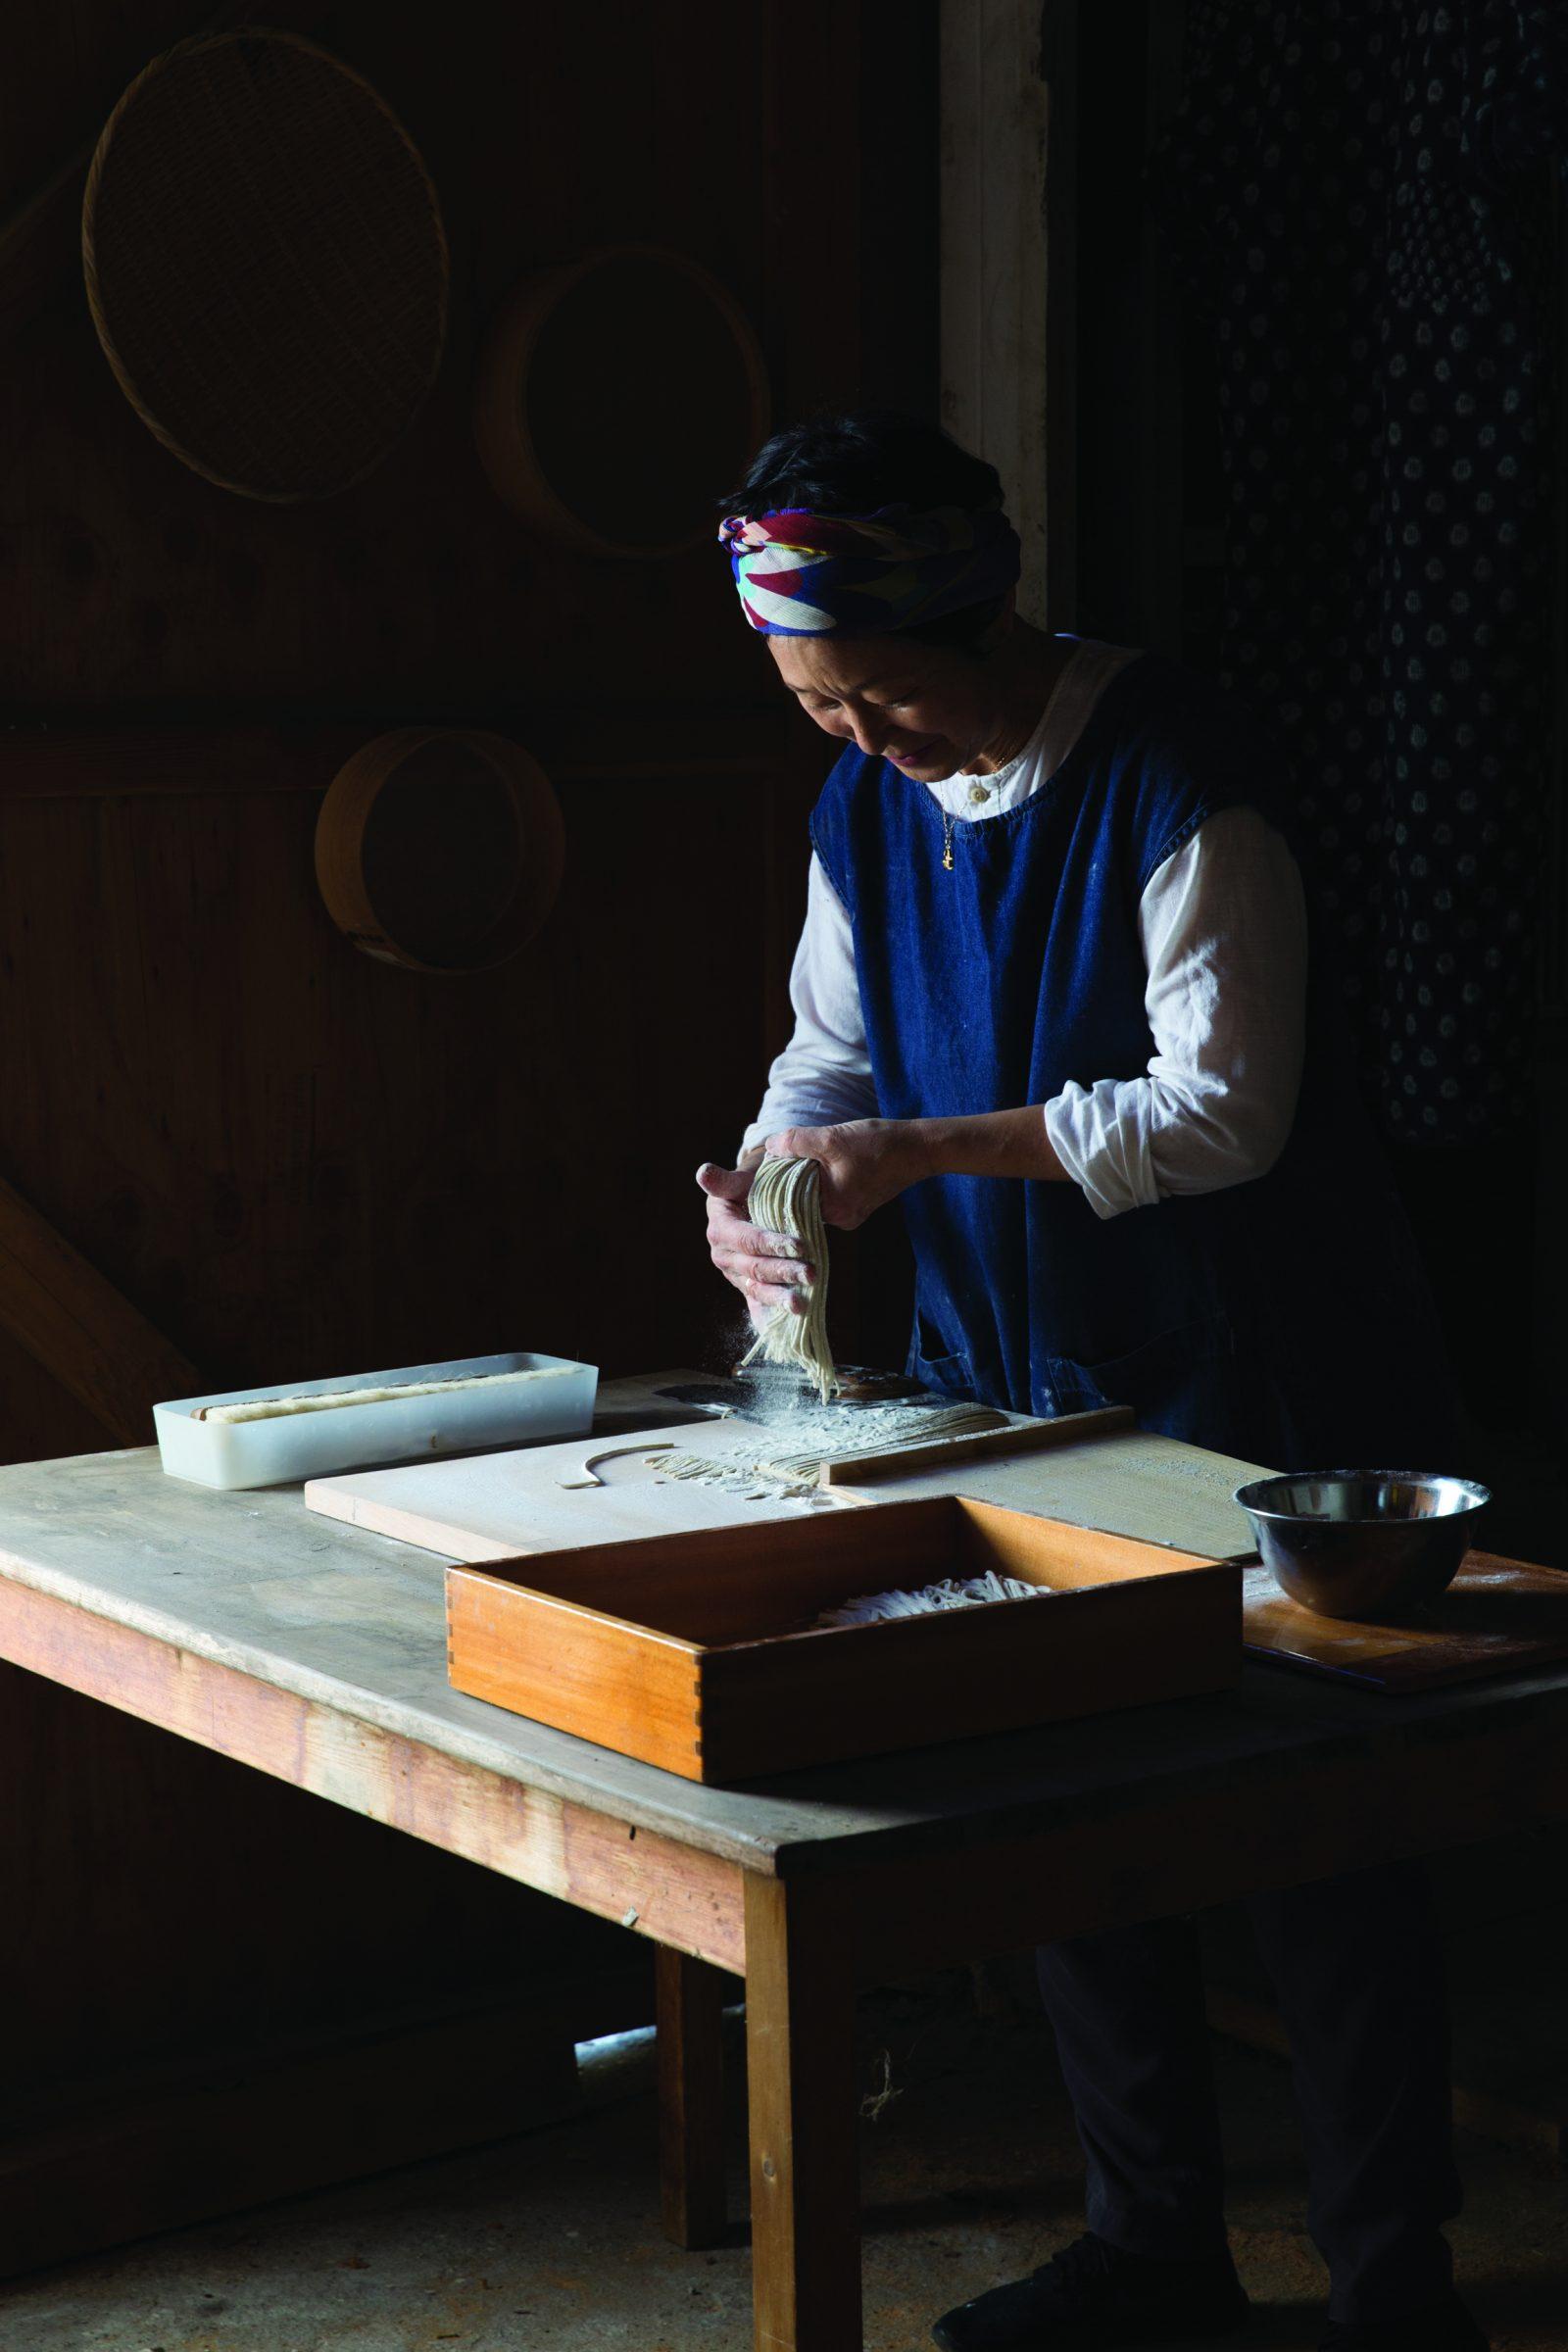 Inside the Incredible World of Japanese Cooking with Sonoko Sakai